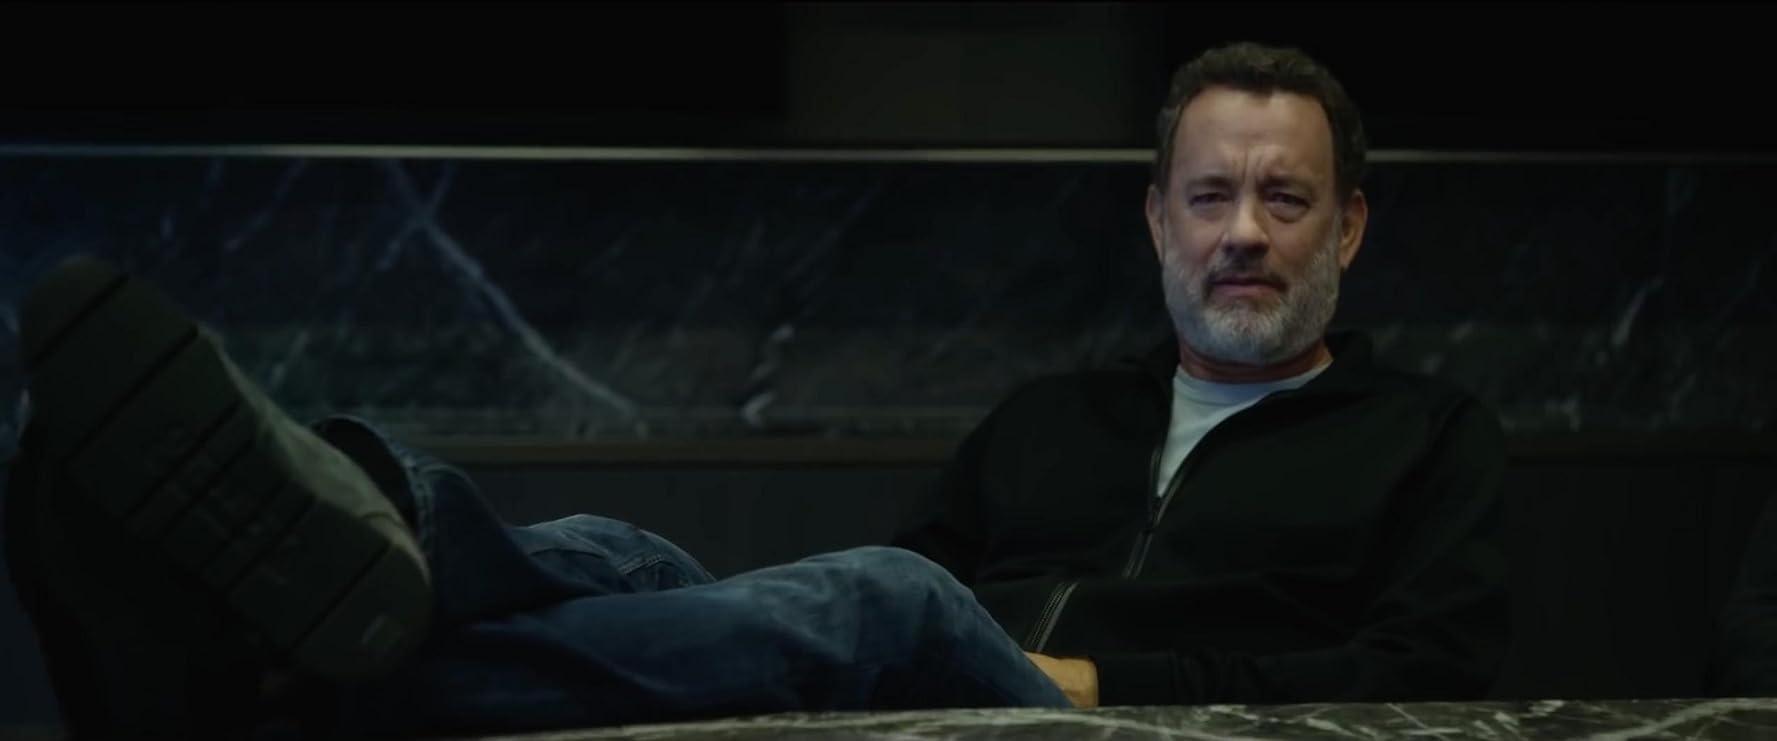 Tom Hanks in The Circle (2017)